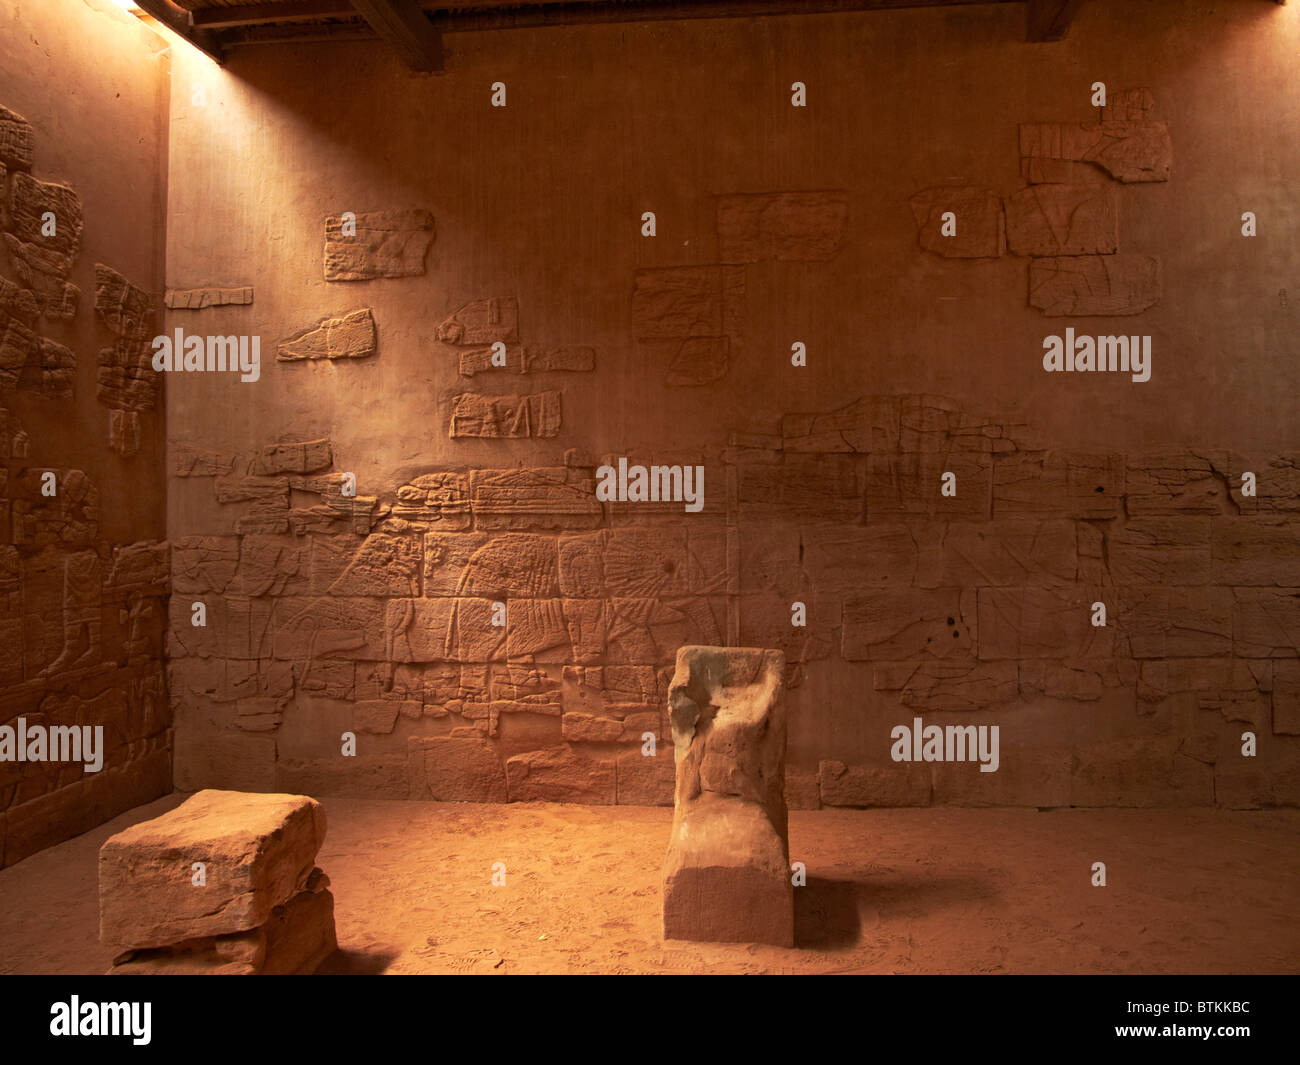 Sudan Musawwarat lion temple - Stock Image